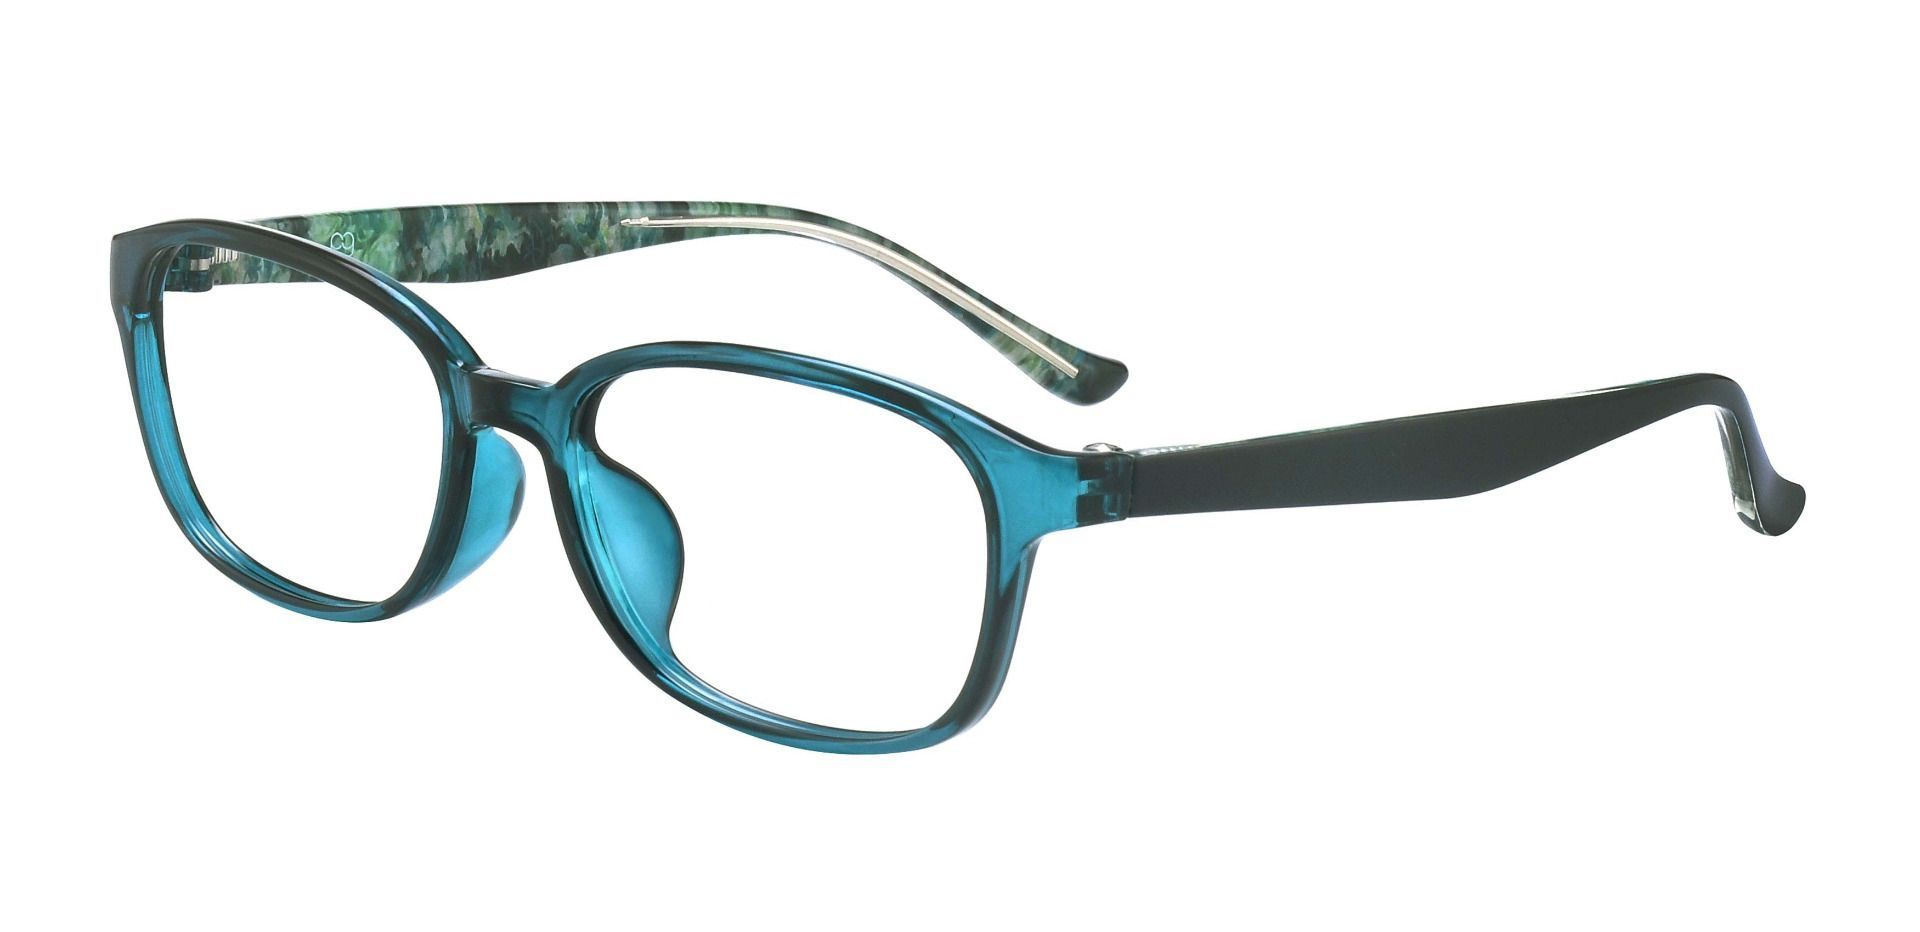 Hemingway Oval Prescription Glasses - Blue